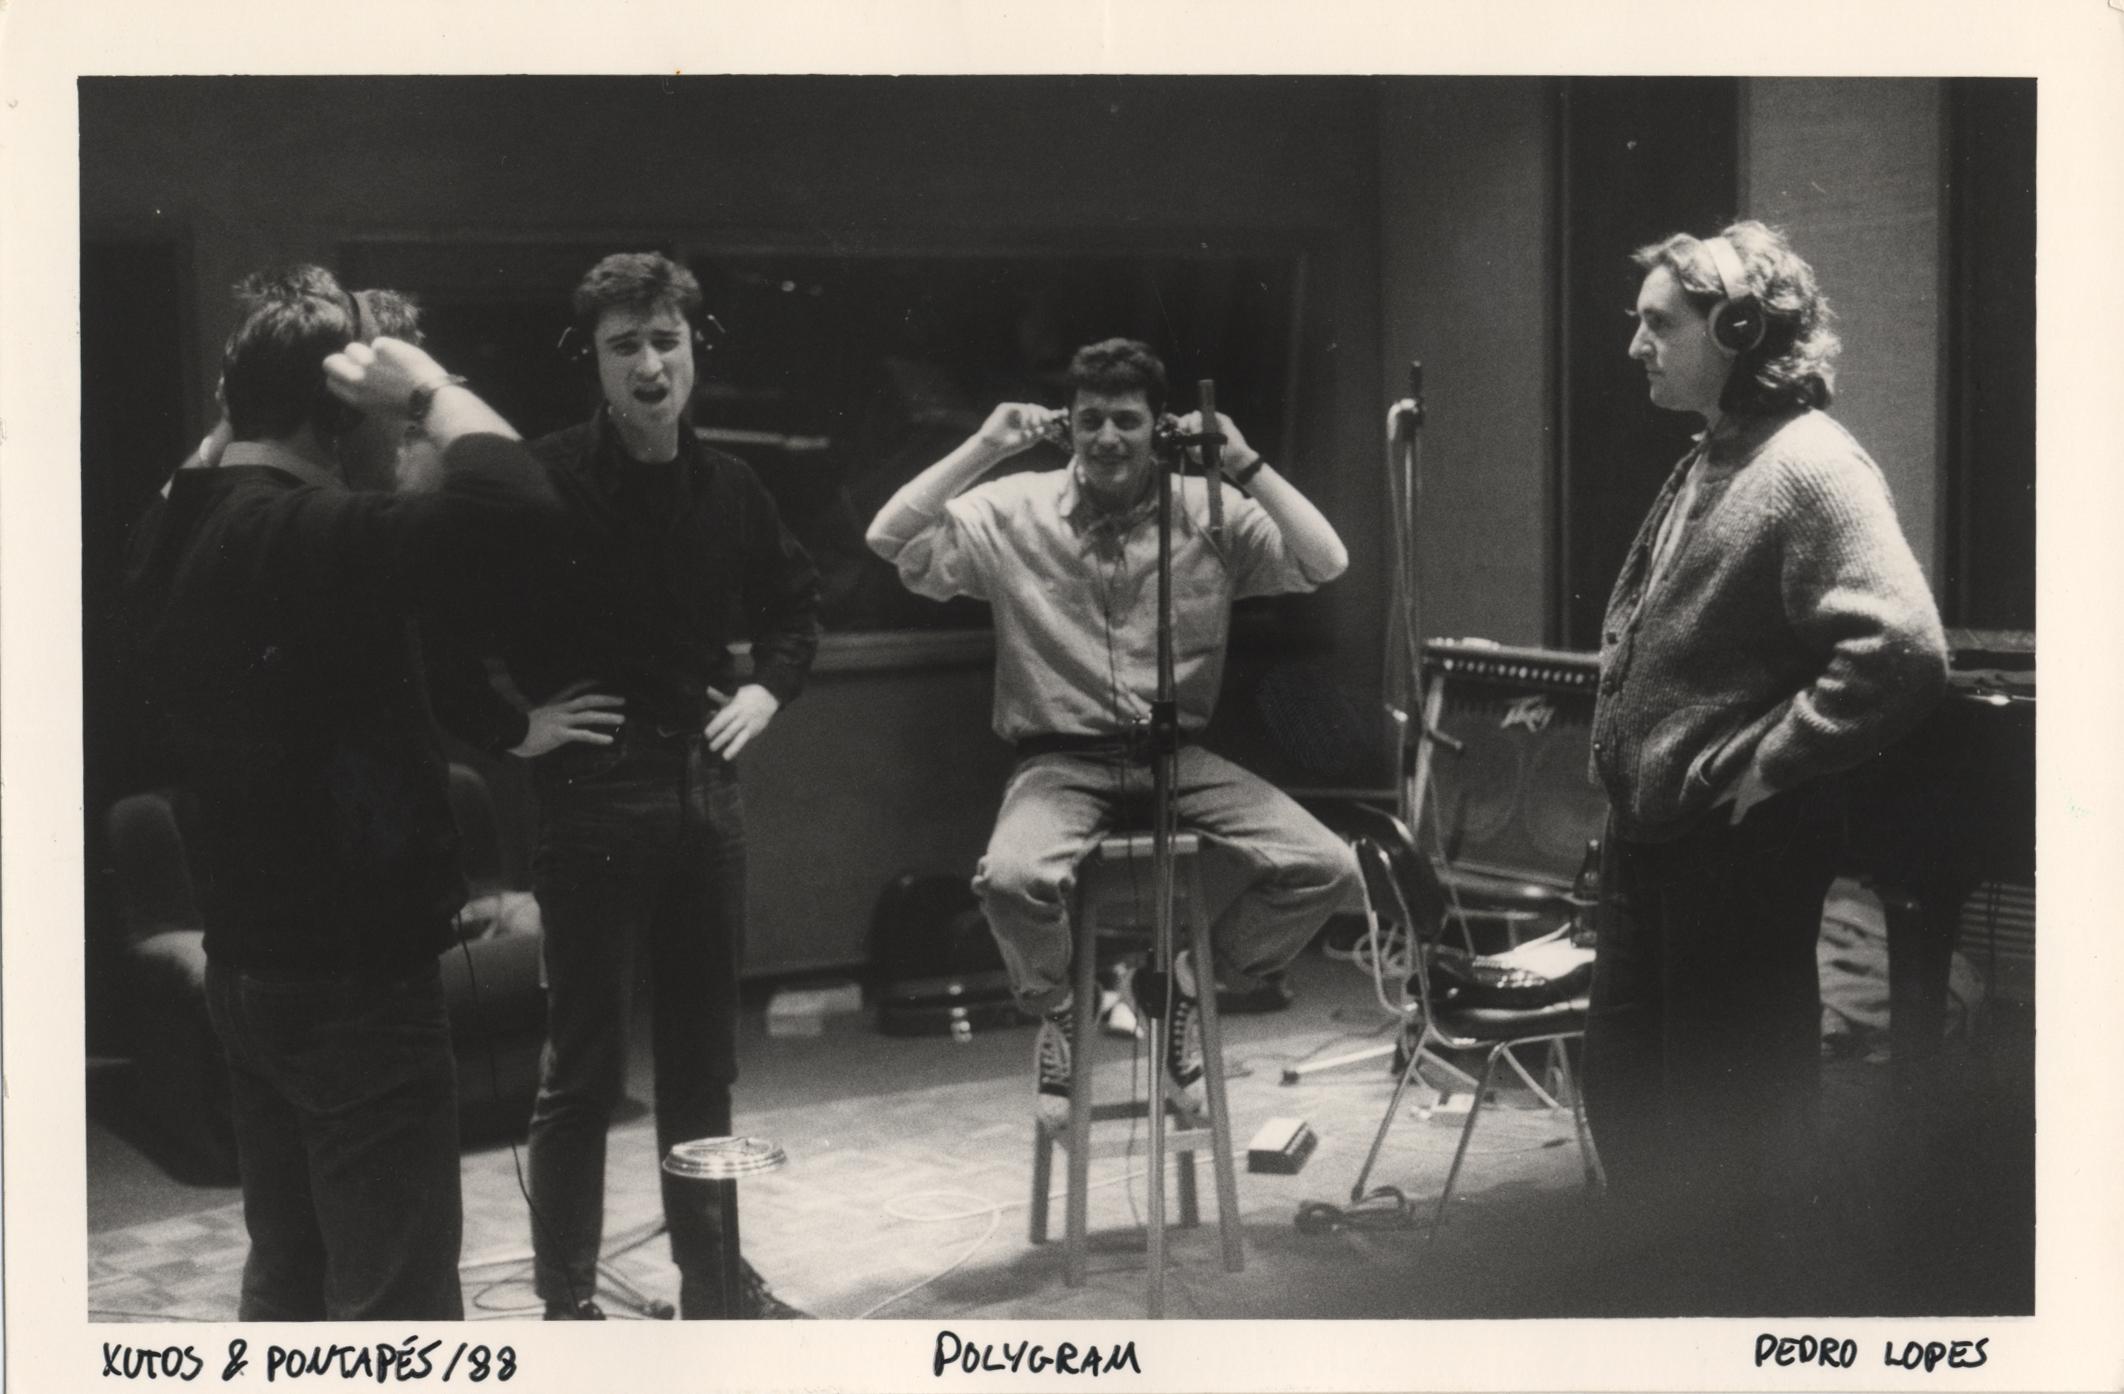 1988 Polygram Pedro Lopes